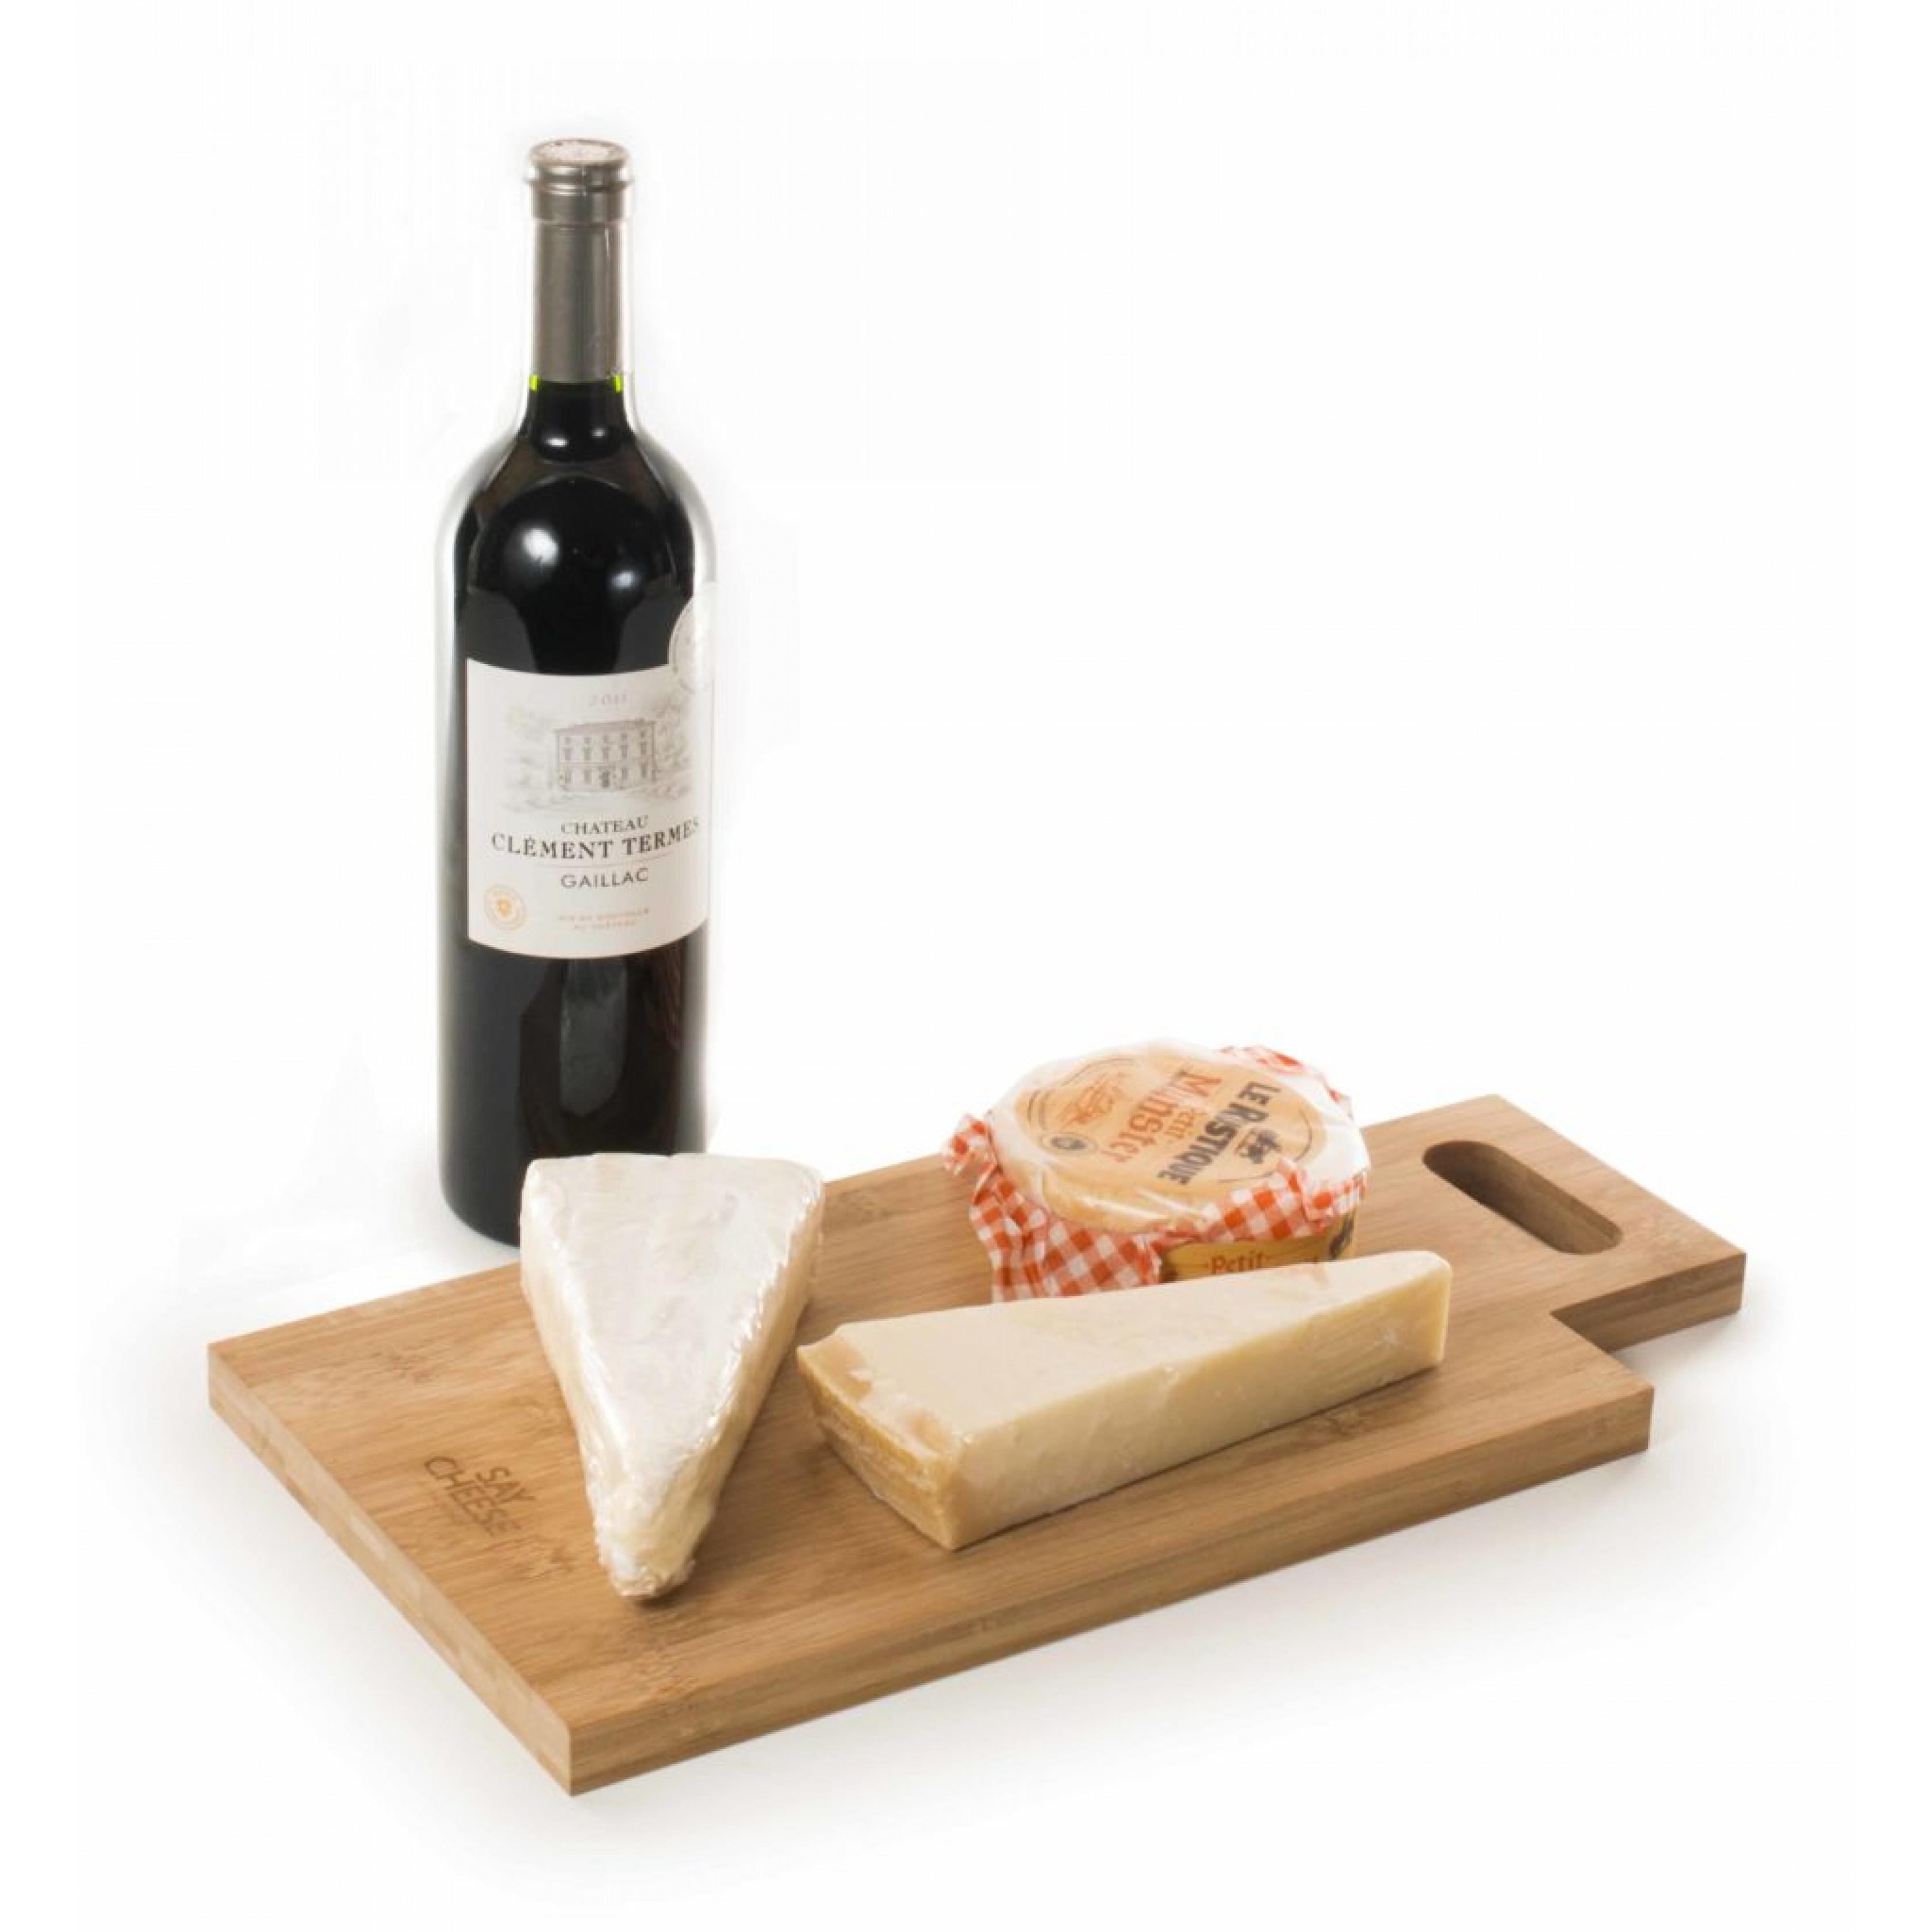 2-in-1-Weinkiste & Käsebrett sagen Käse